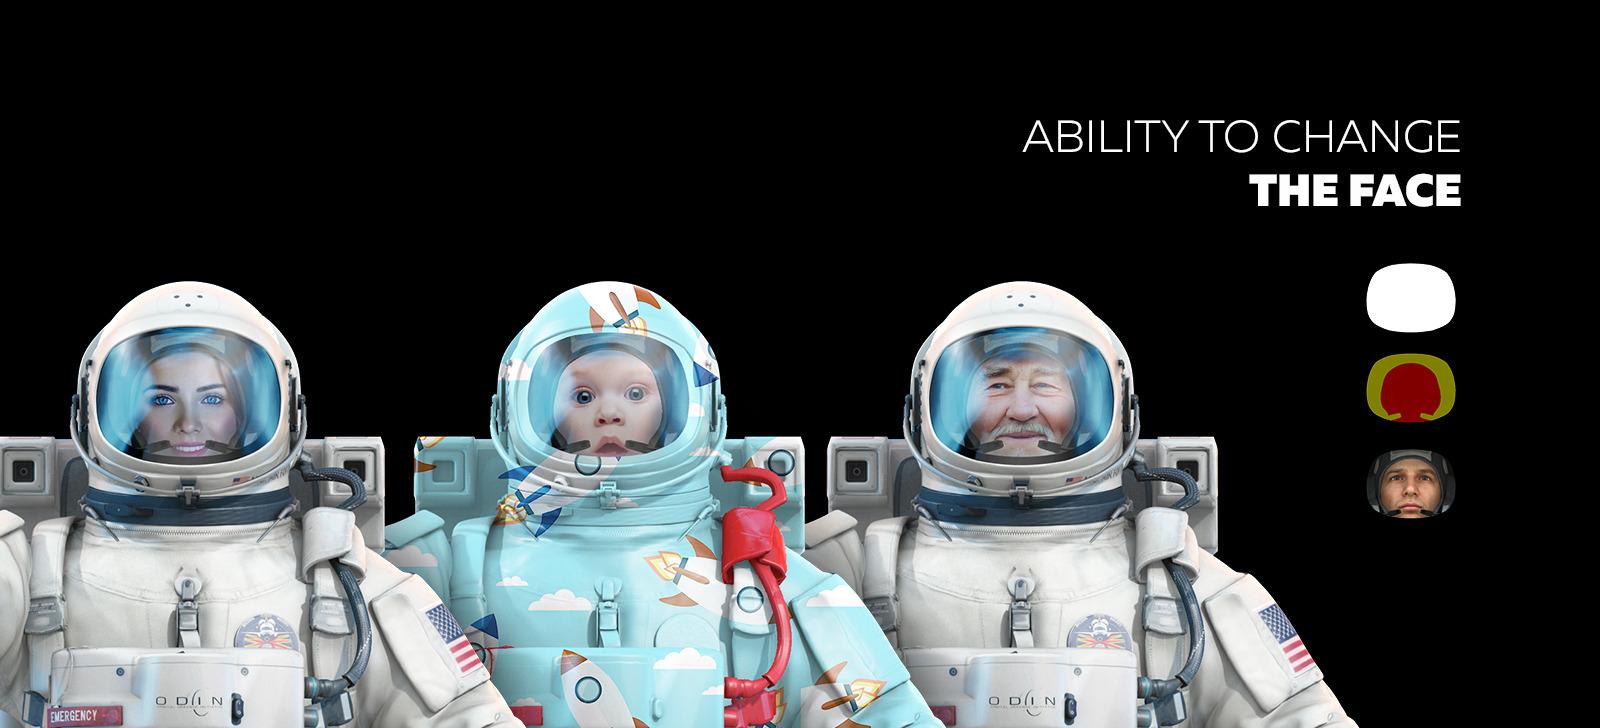 3D Mockup Space Astronaut #15